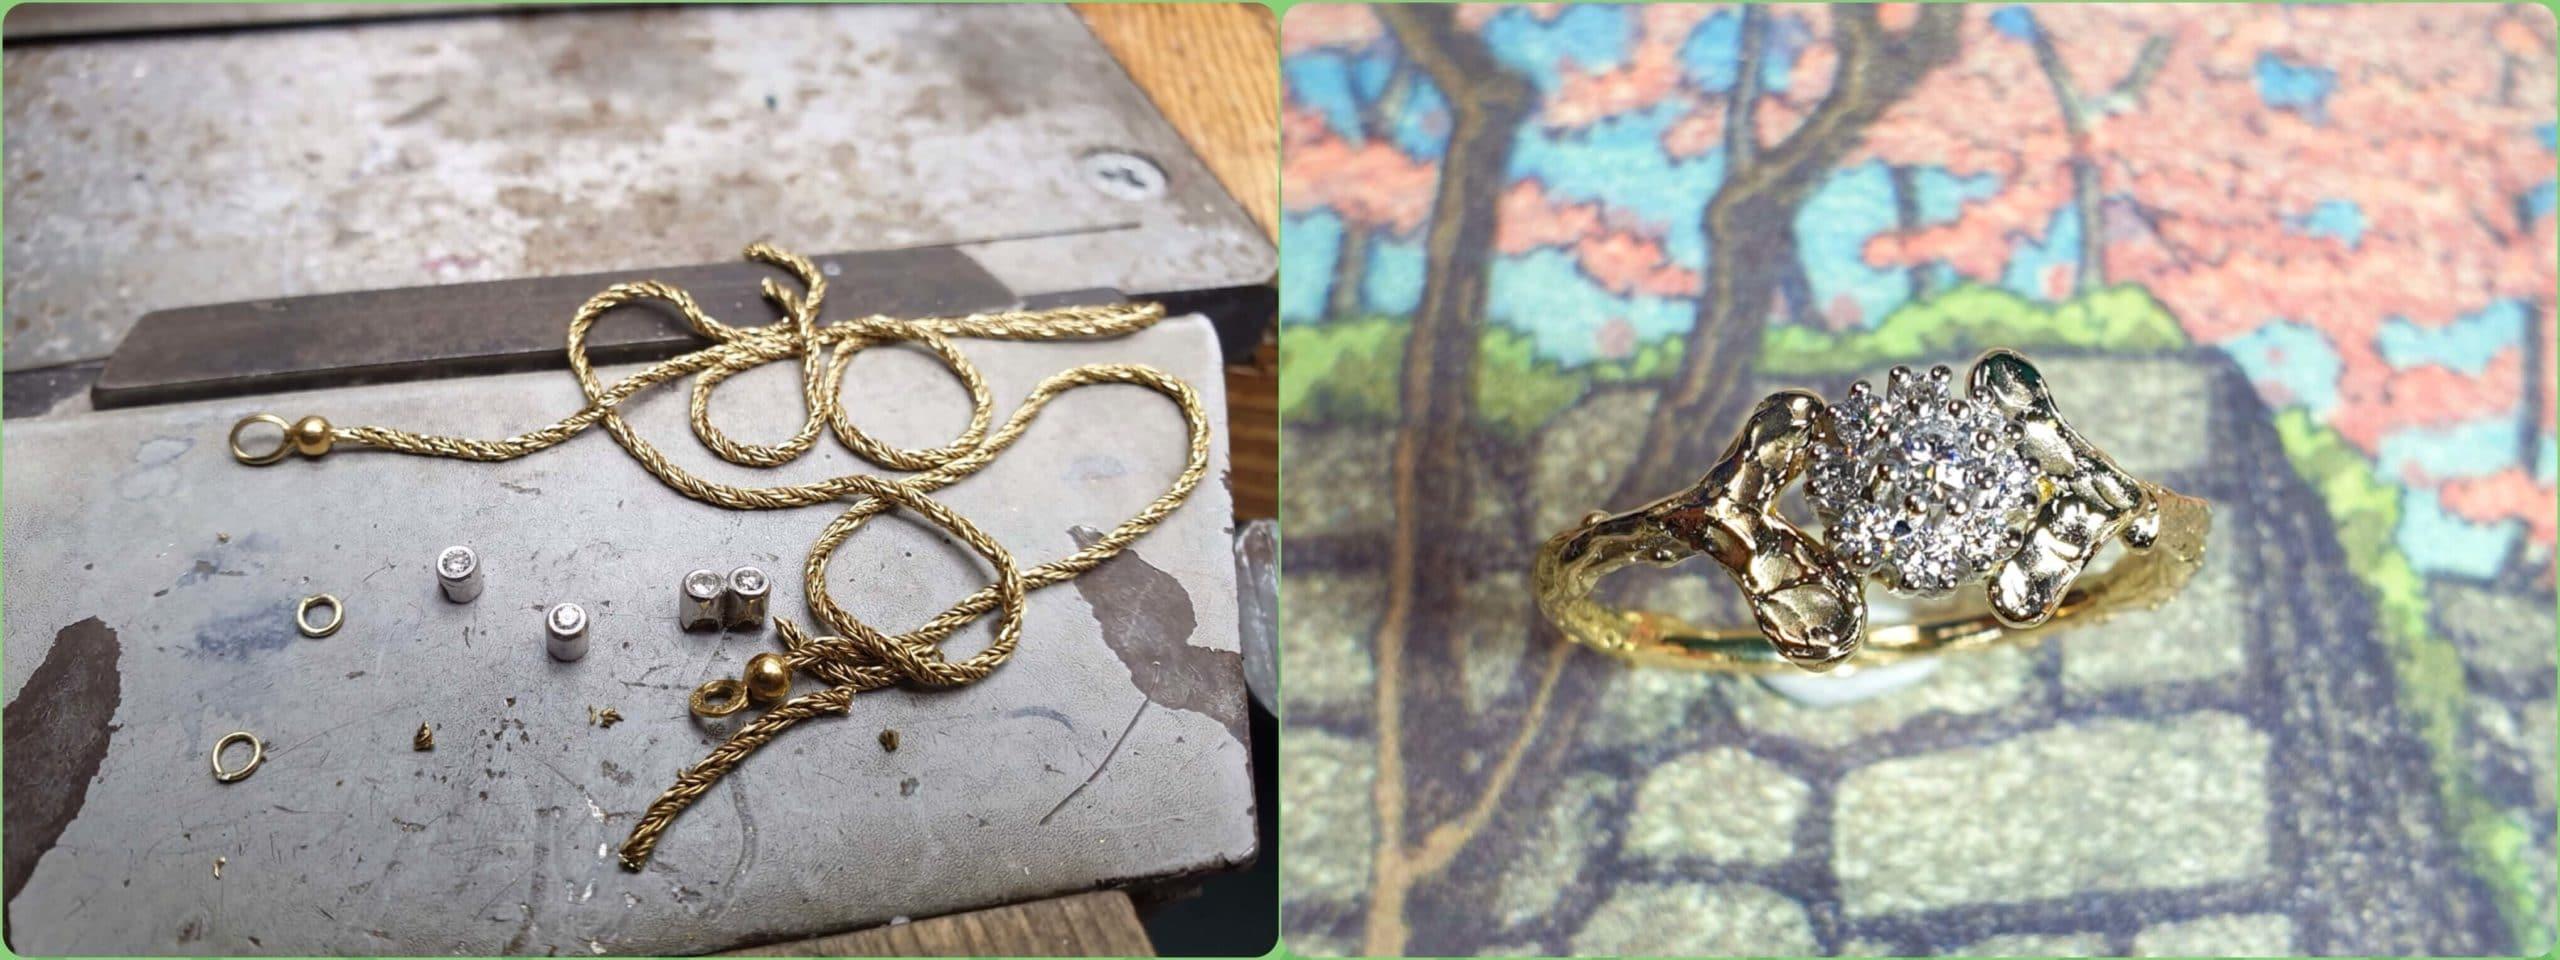 blog sieraden oud goud omsmelten. Oogst Goudsmid Amsterdam.